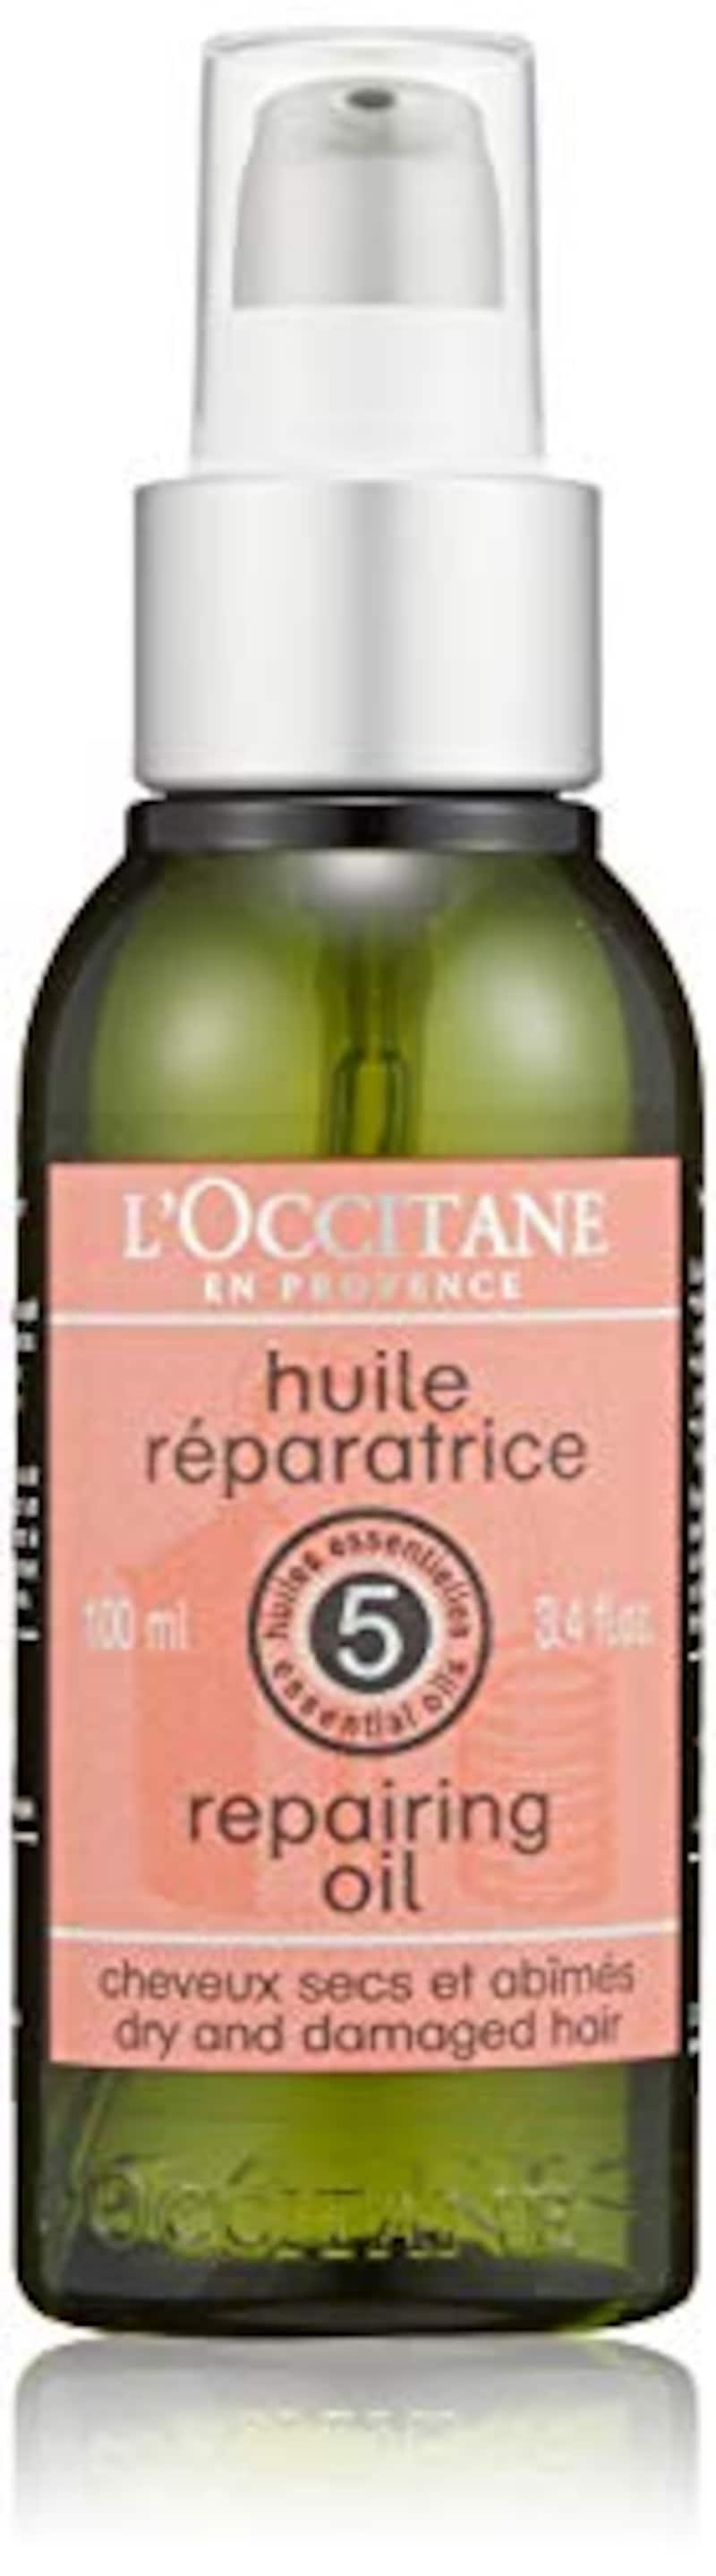 L'OCCITANE(ロクシタン),ファイブハーブス リペアリングヘアオイル